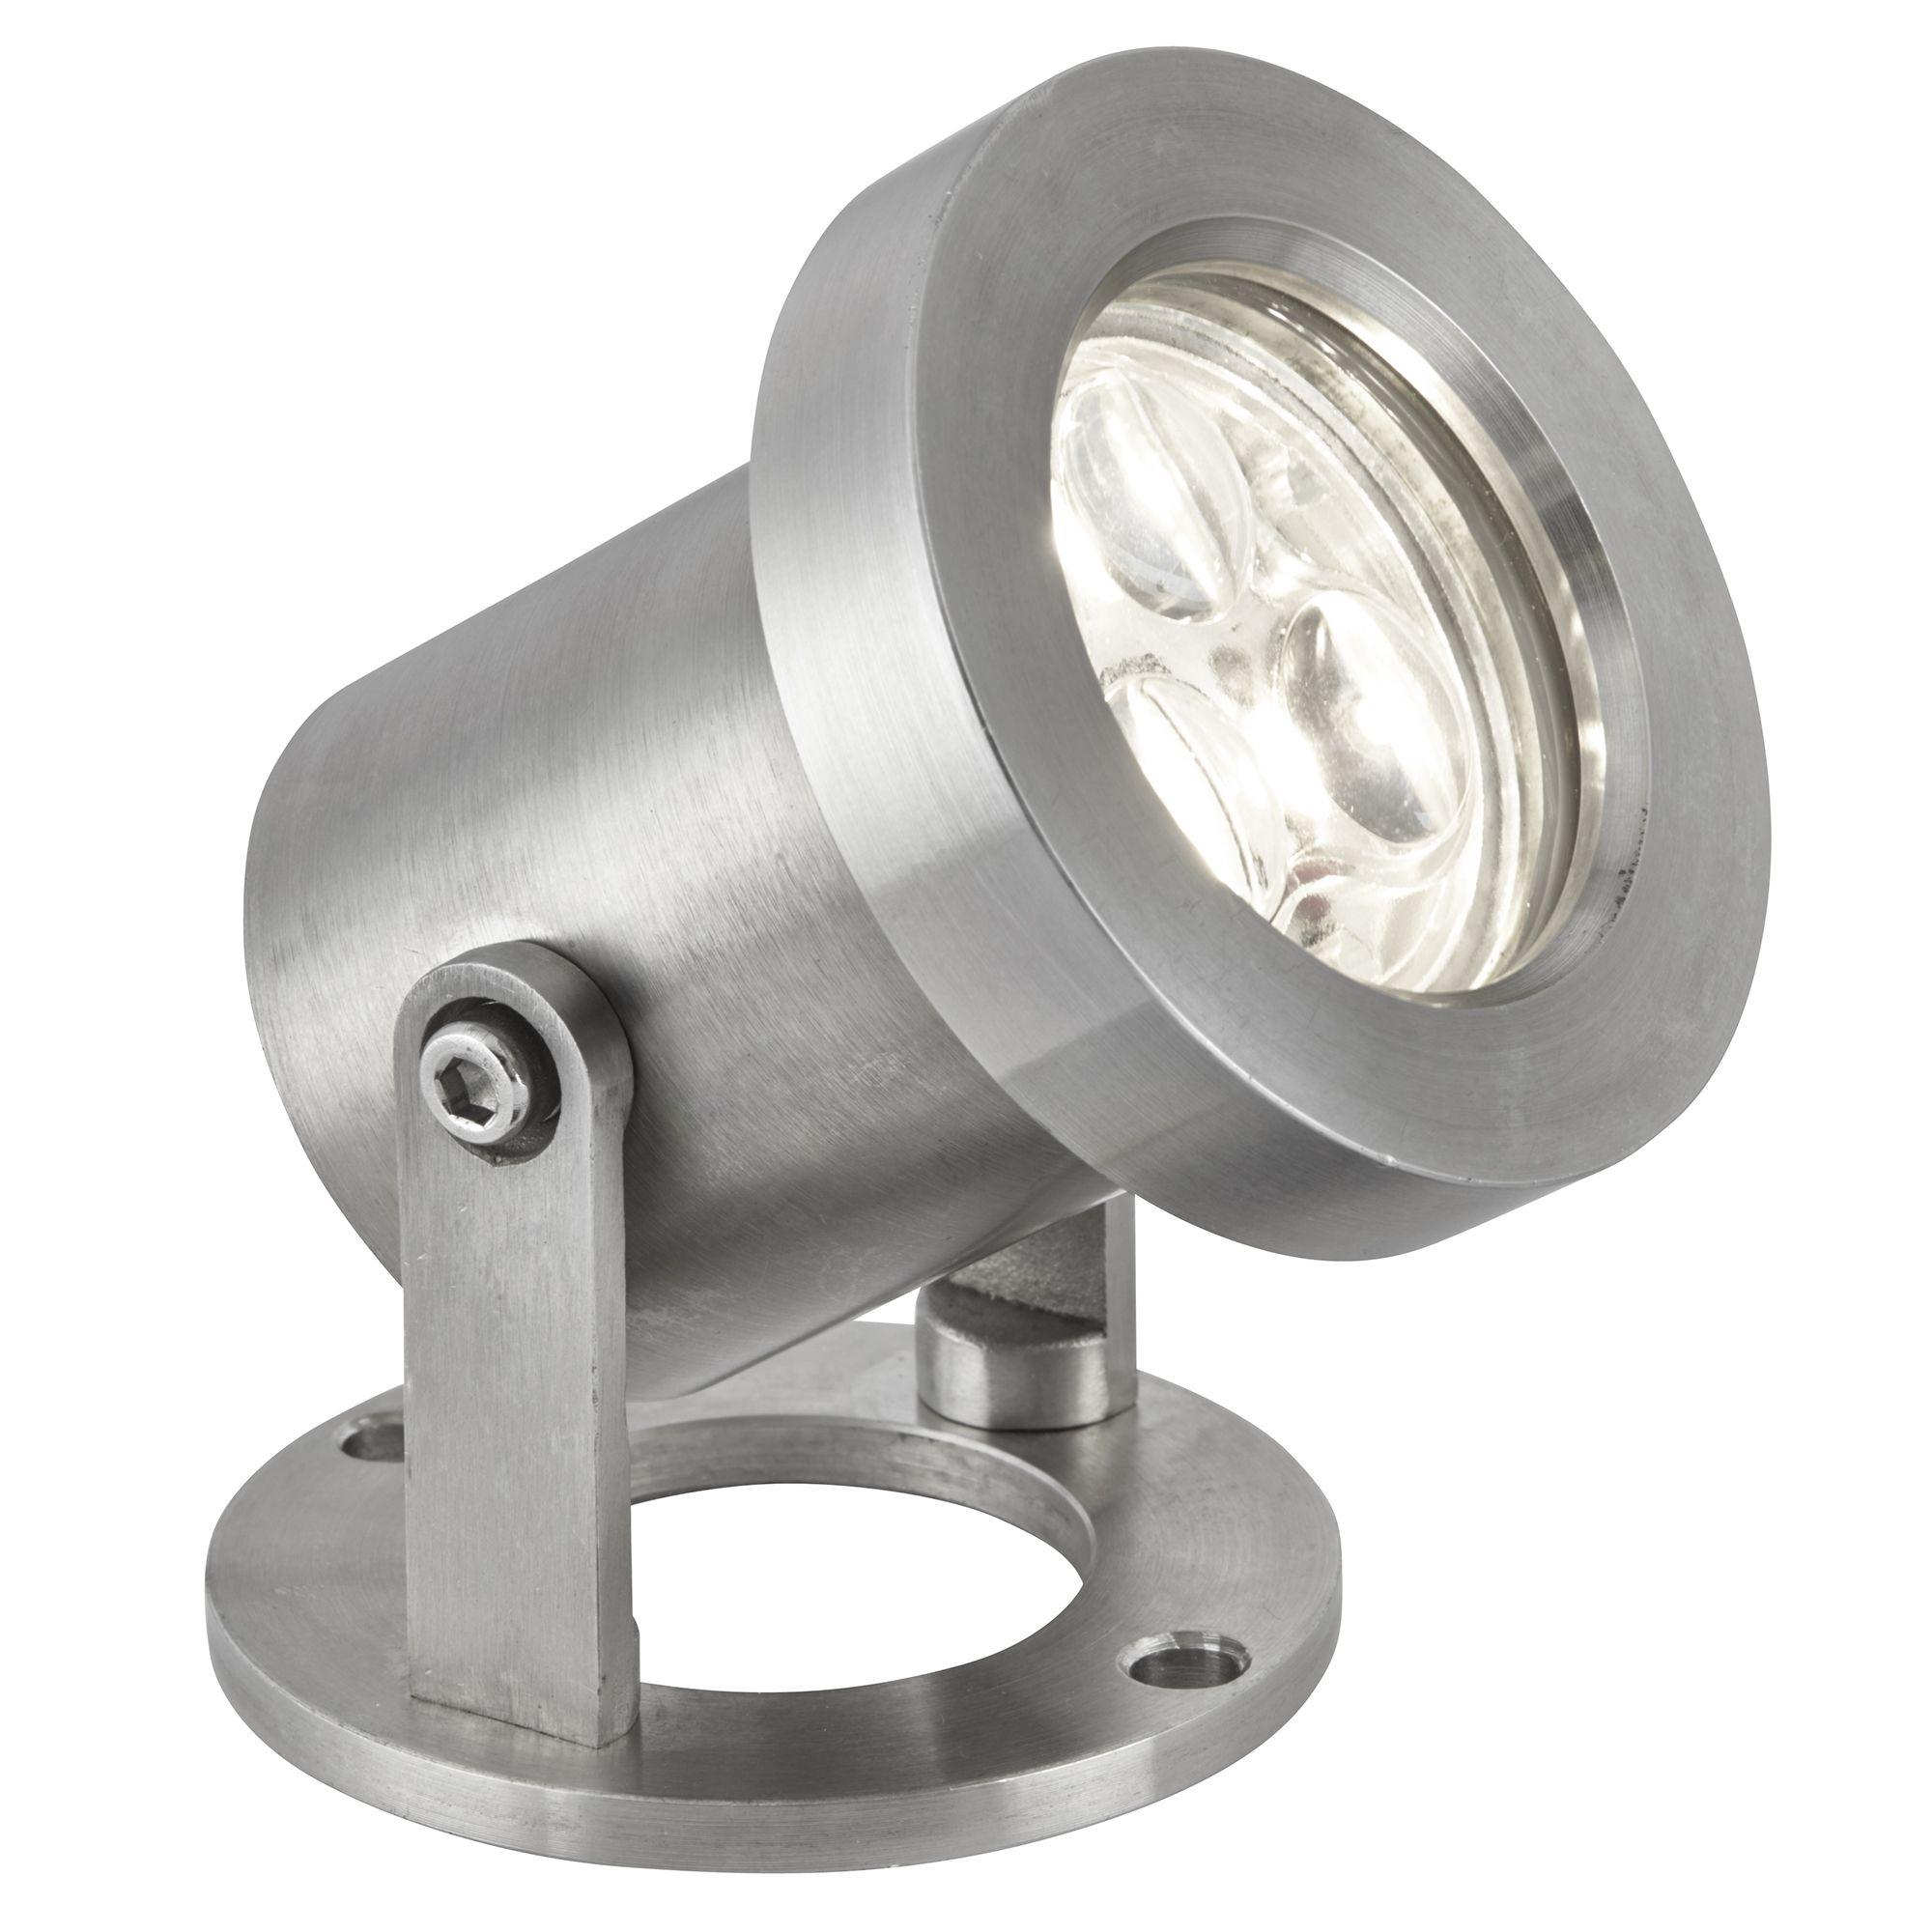 Stainless Steel Ip65 Led Outdoor Spotlight